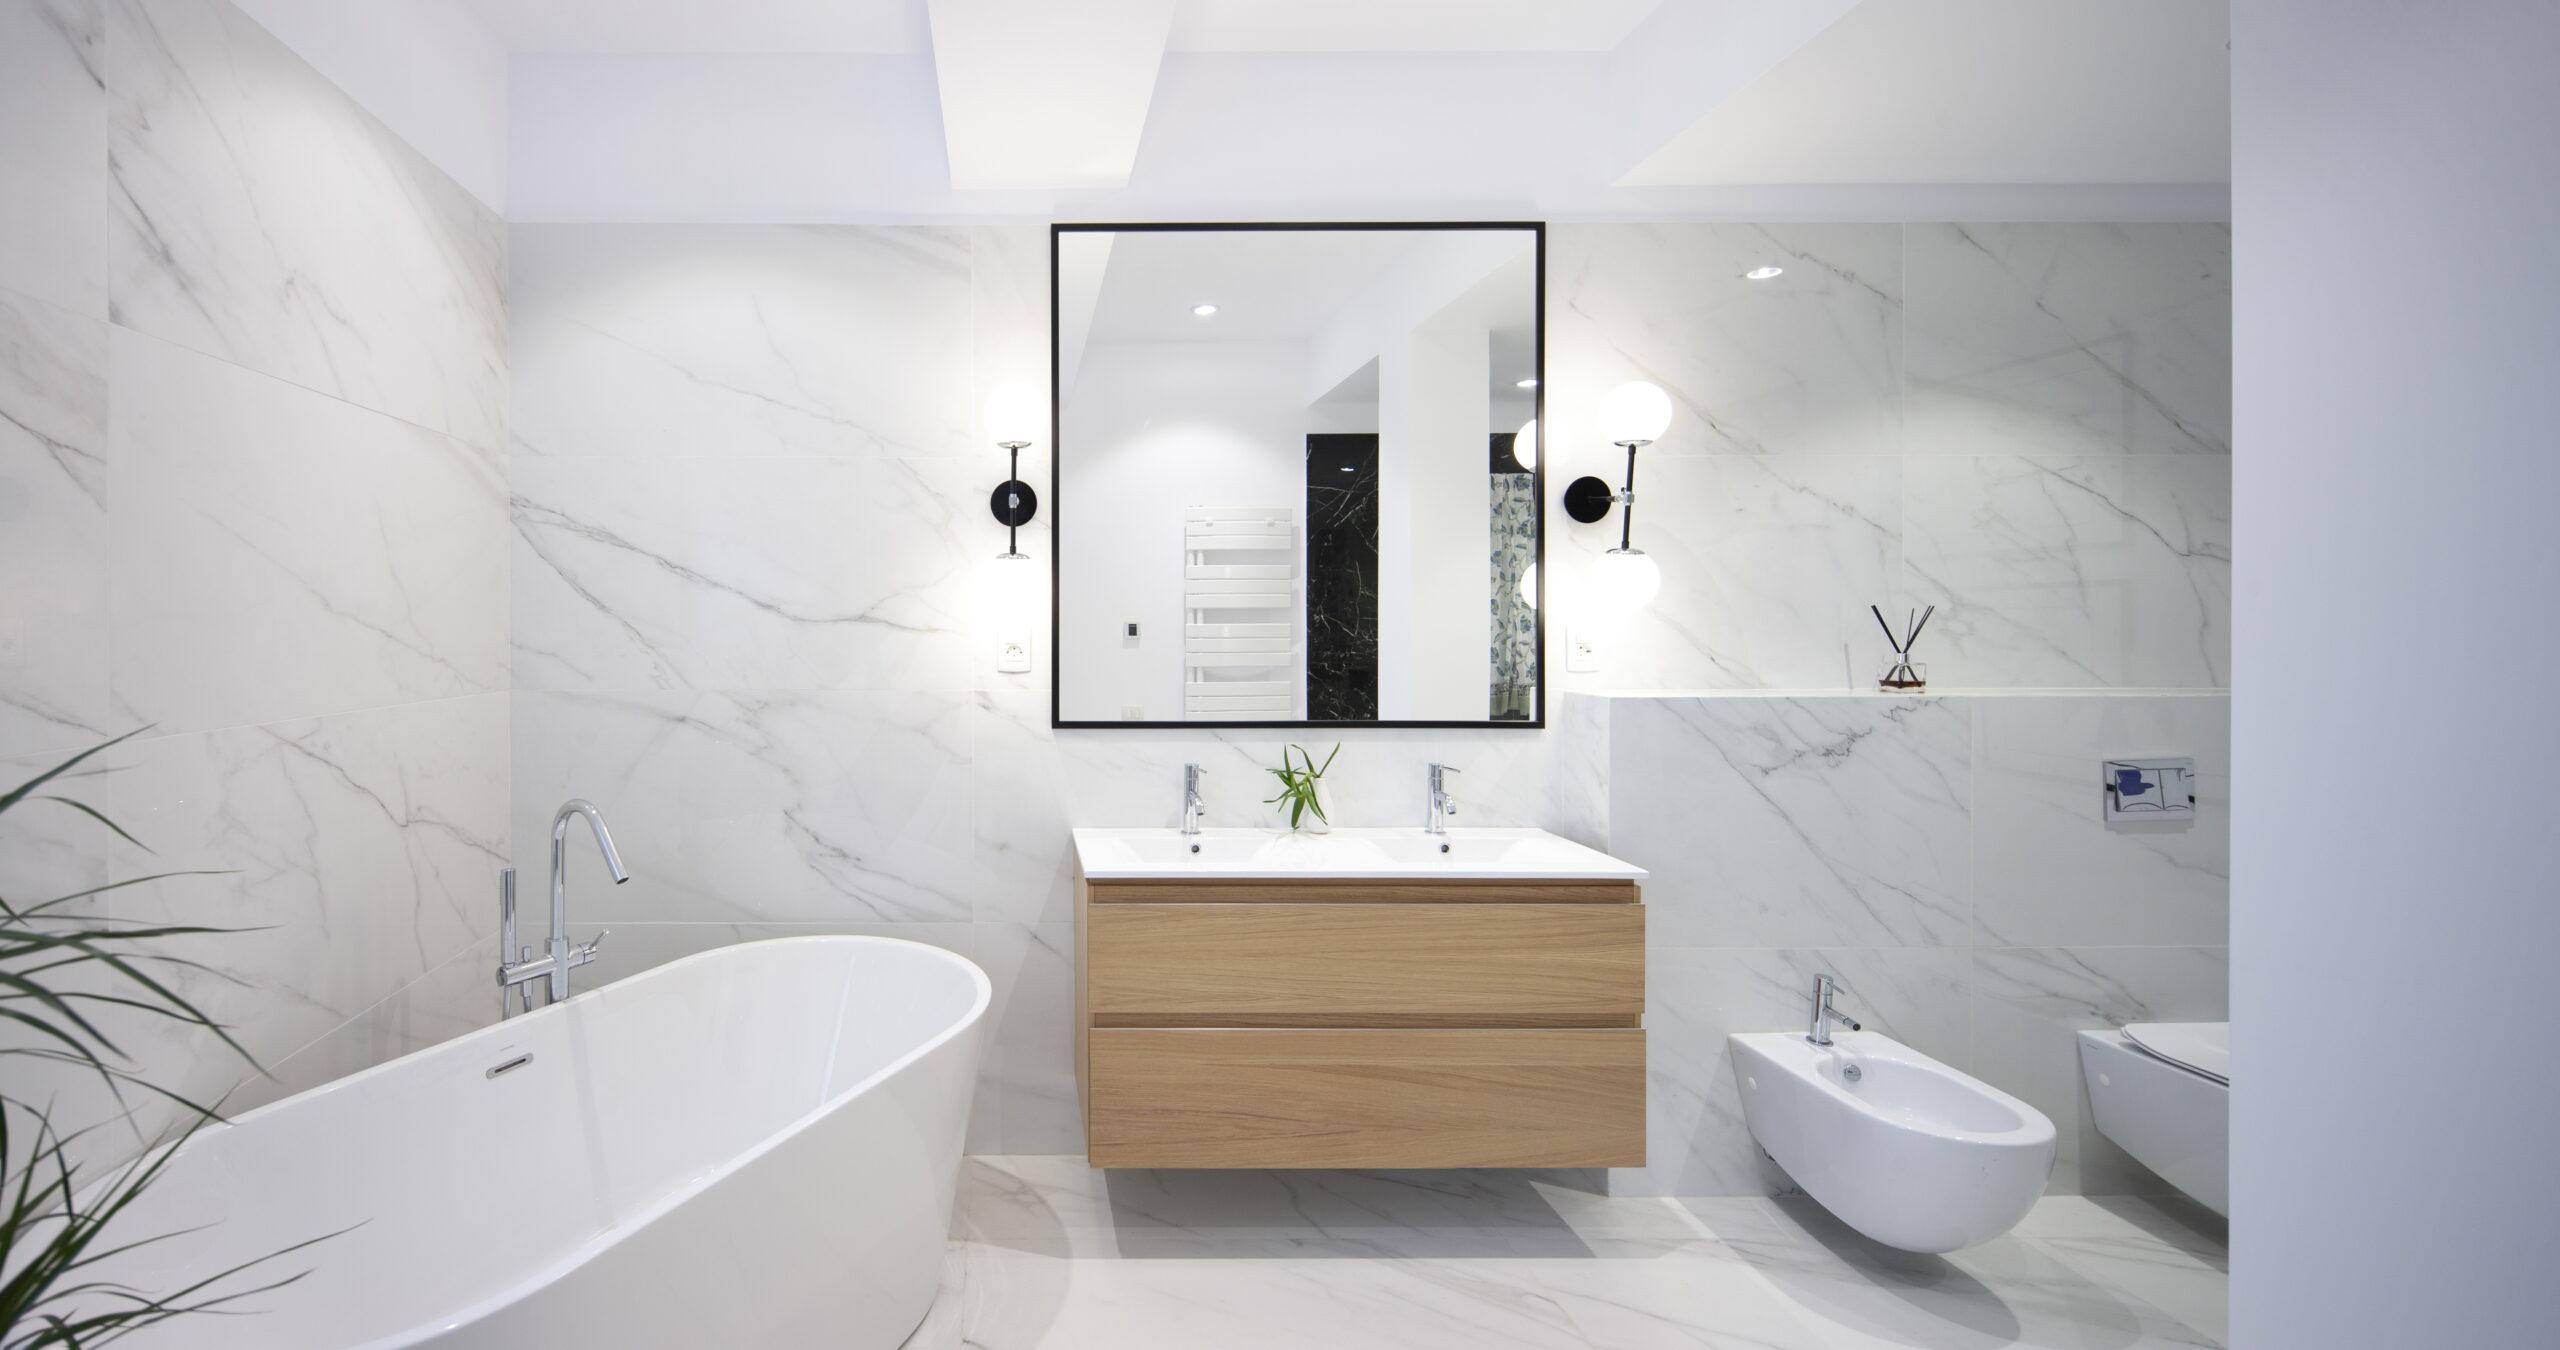 https://nbc-arhitect.ro/wp-content/uploads/2020/11/Collection-10_7-Design-Interior-scaled.jpg